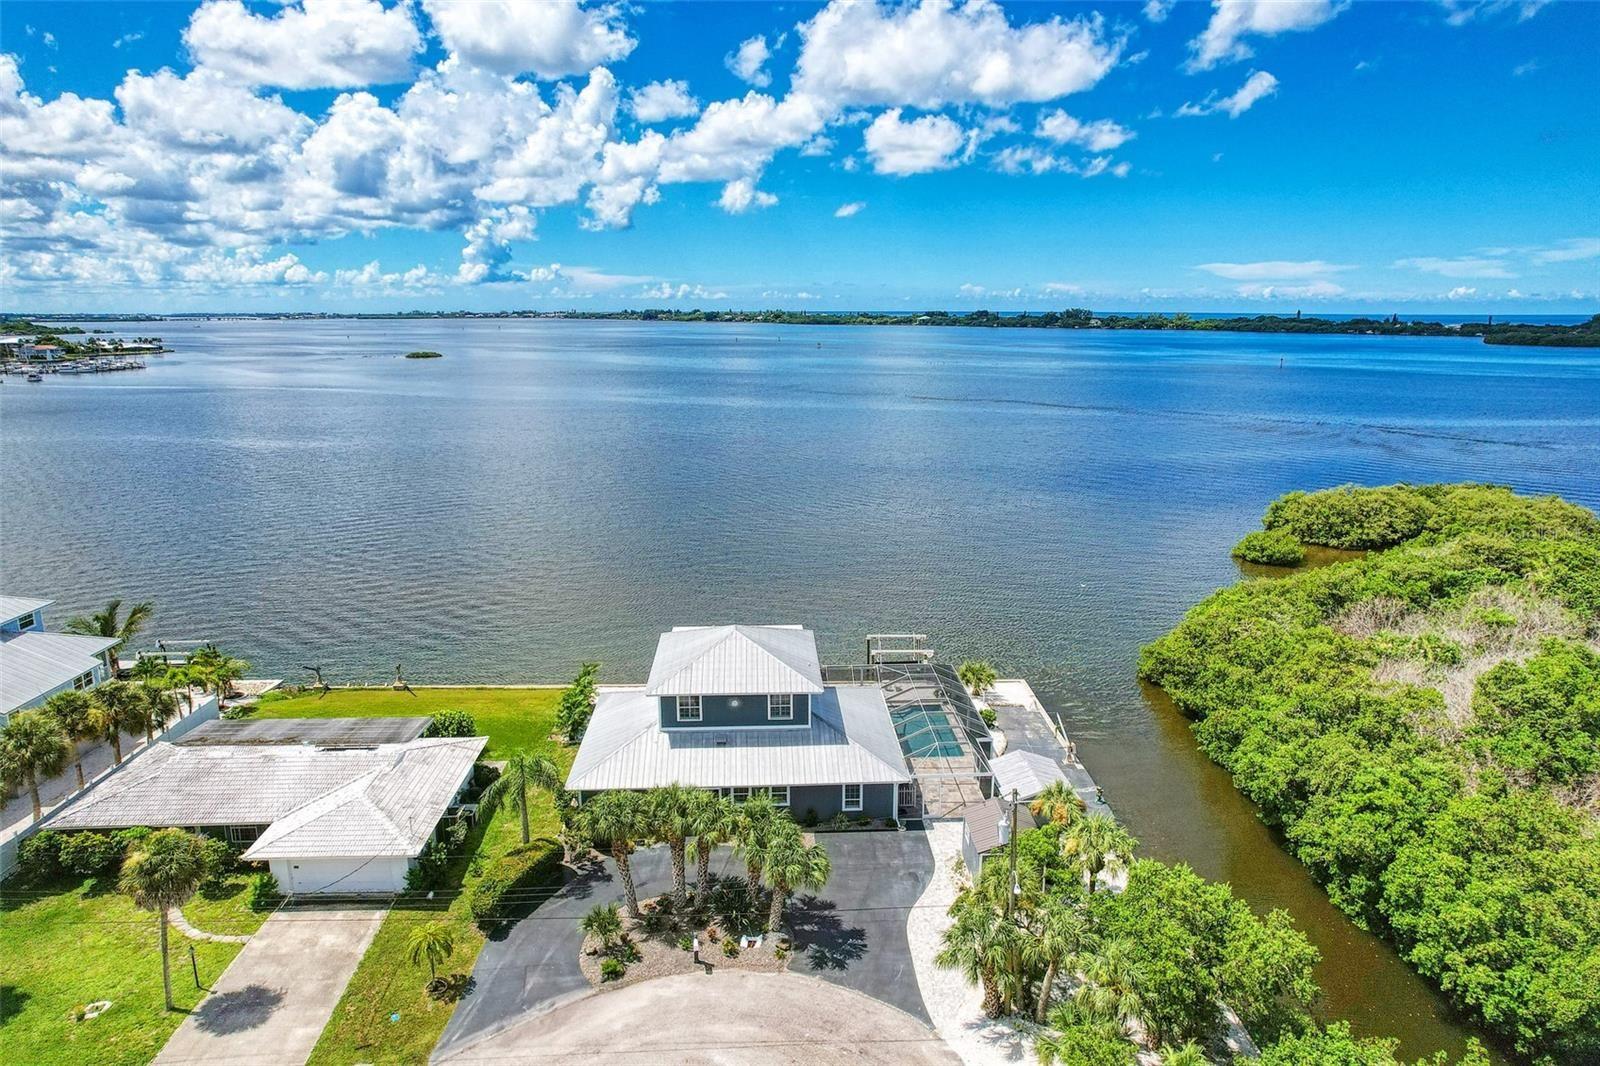 Photo of 949 SUNCREST LANE, ENGLEWOOD, FL 34223 (MLS # D6120396)